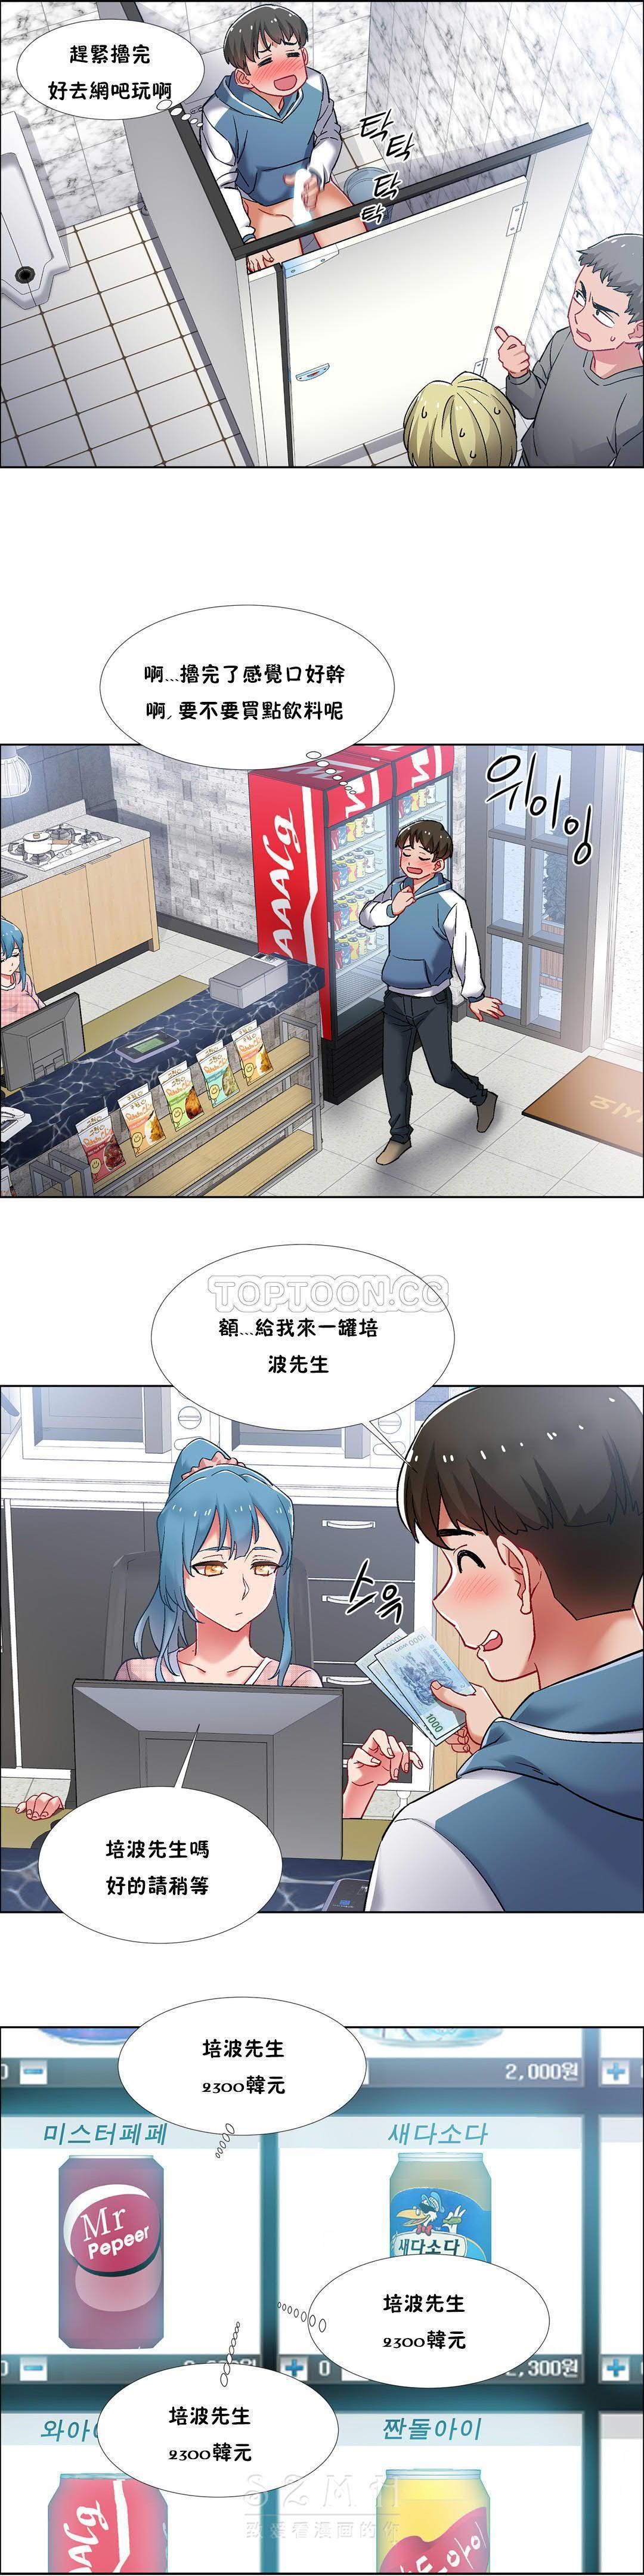 [Studio Wannabe] Rental Girls | 出租女郎 Ch. 33-58 [Chinese]  第二季 完结 38